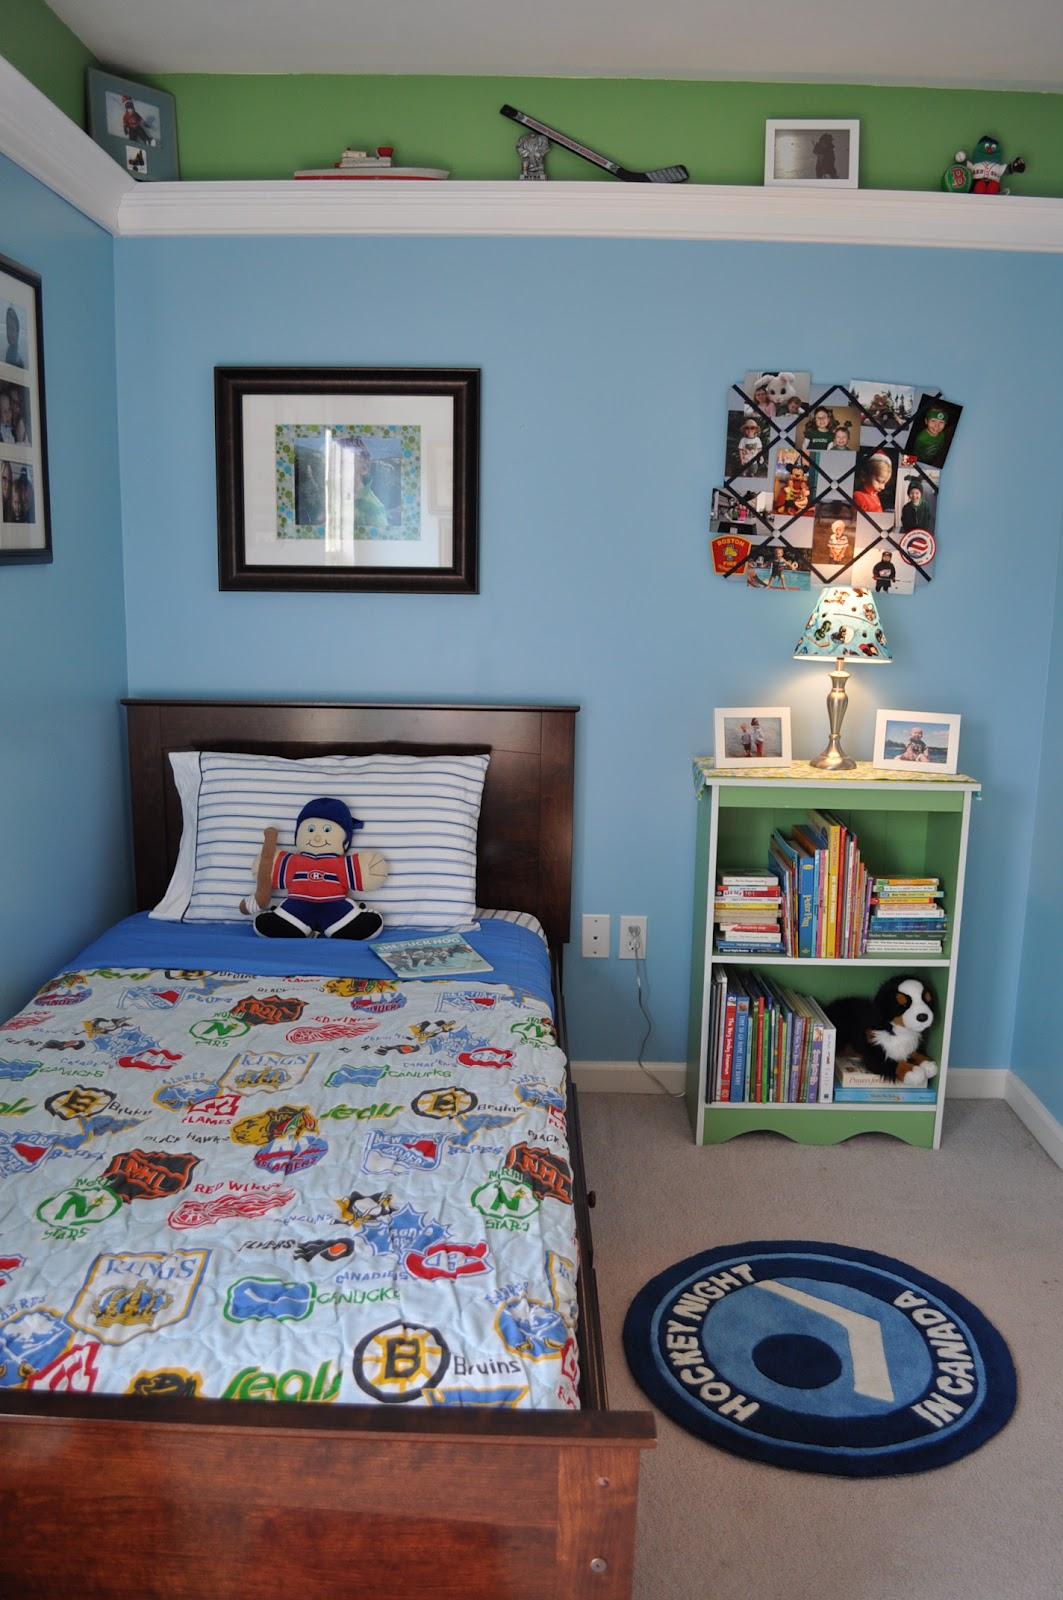 Kids Love Themed Bedroom Sets: Syracuse Hockey Mom's Network: Hockey Room For Kids